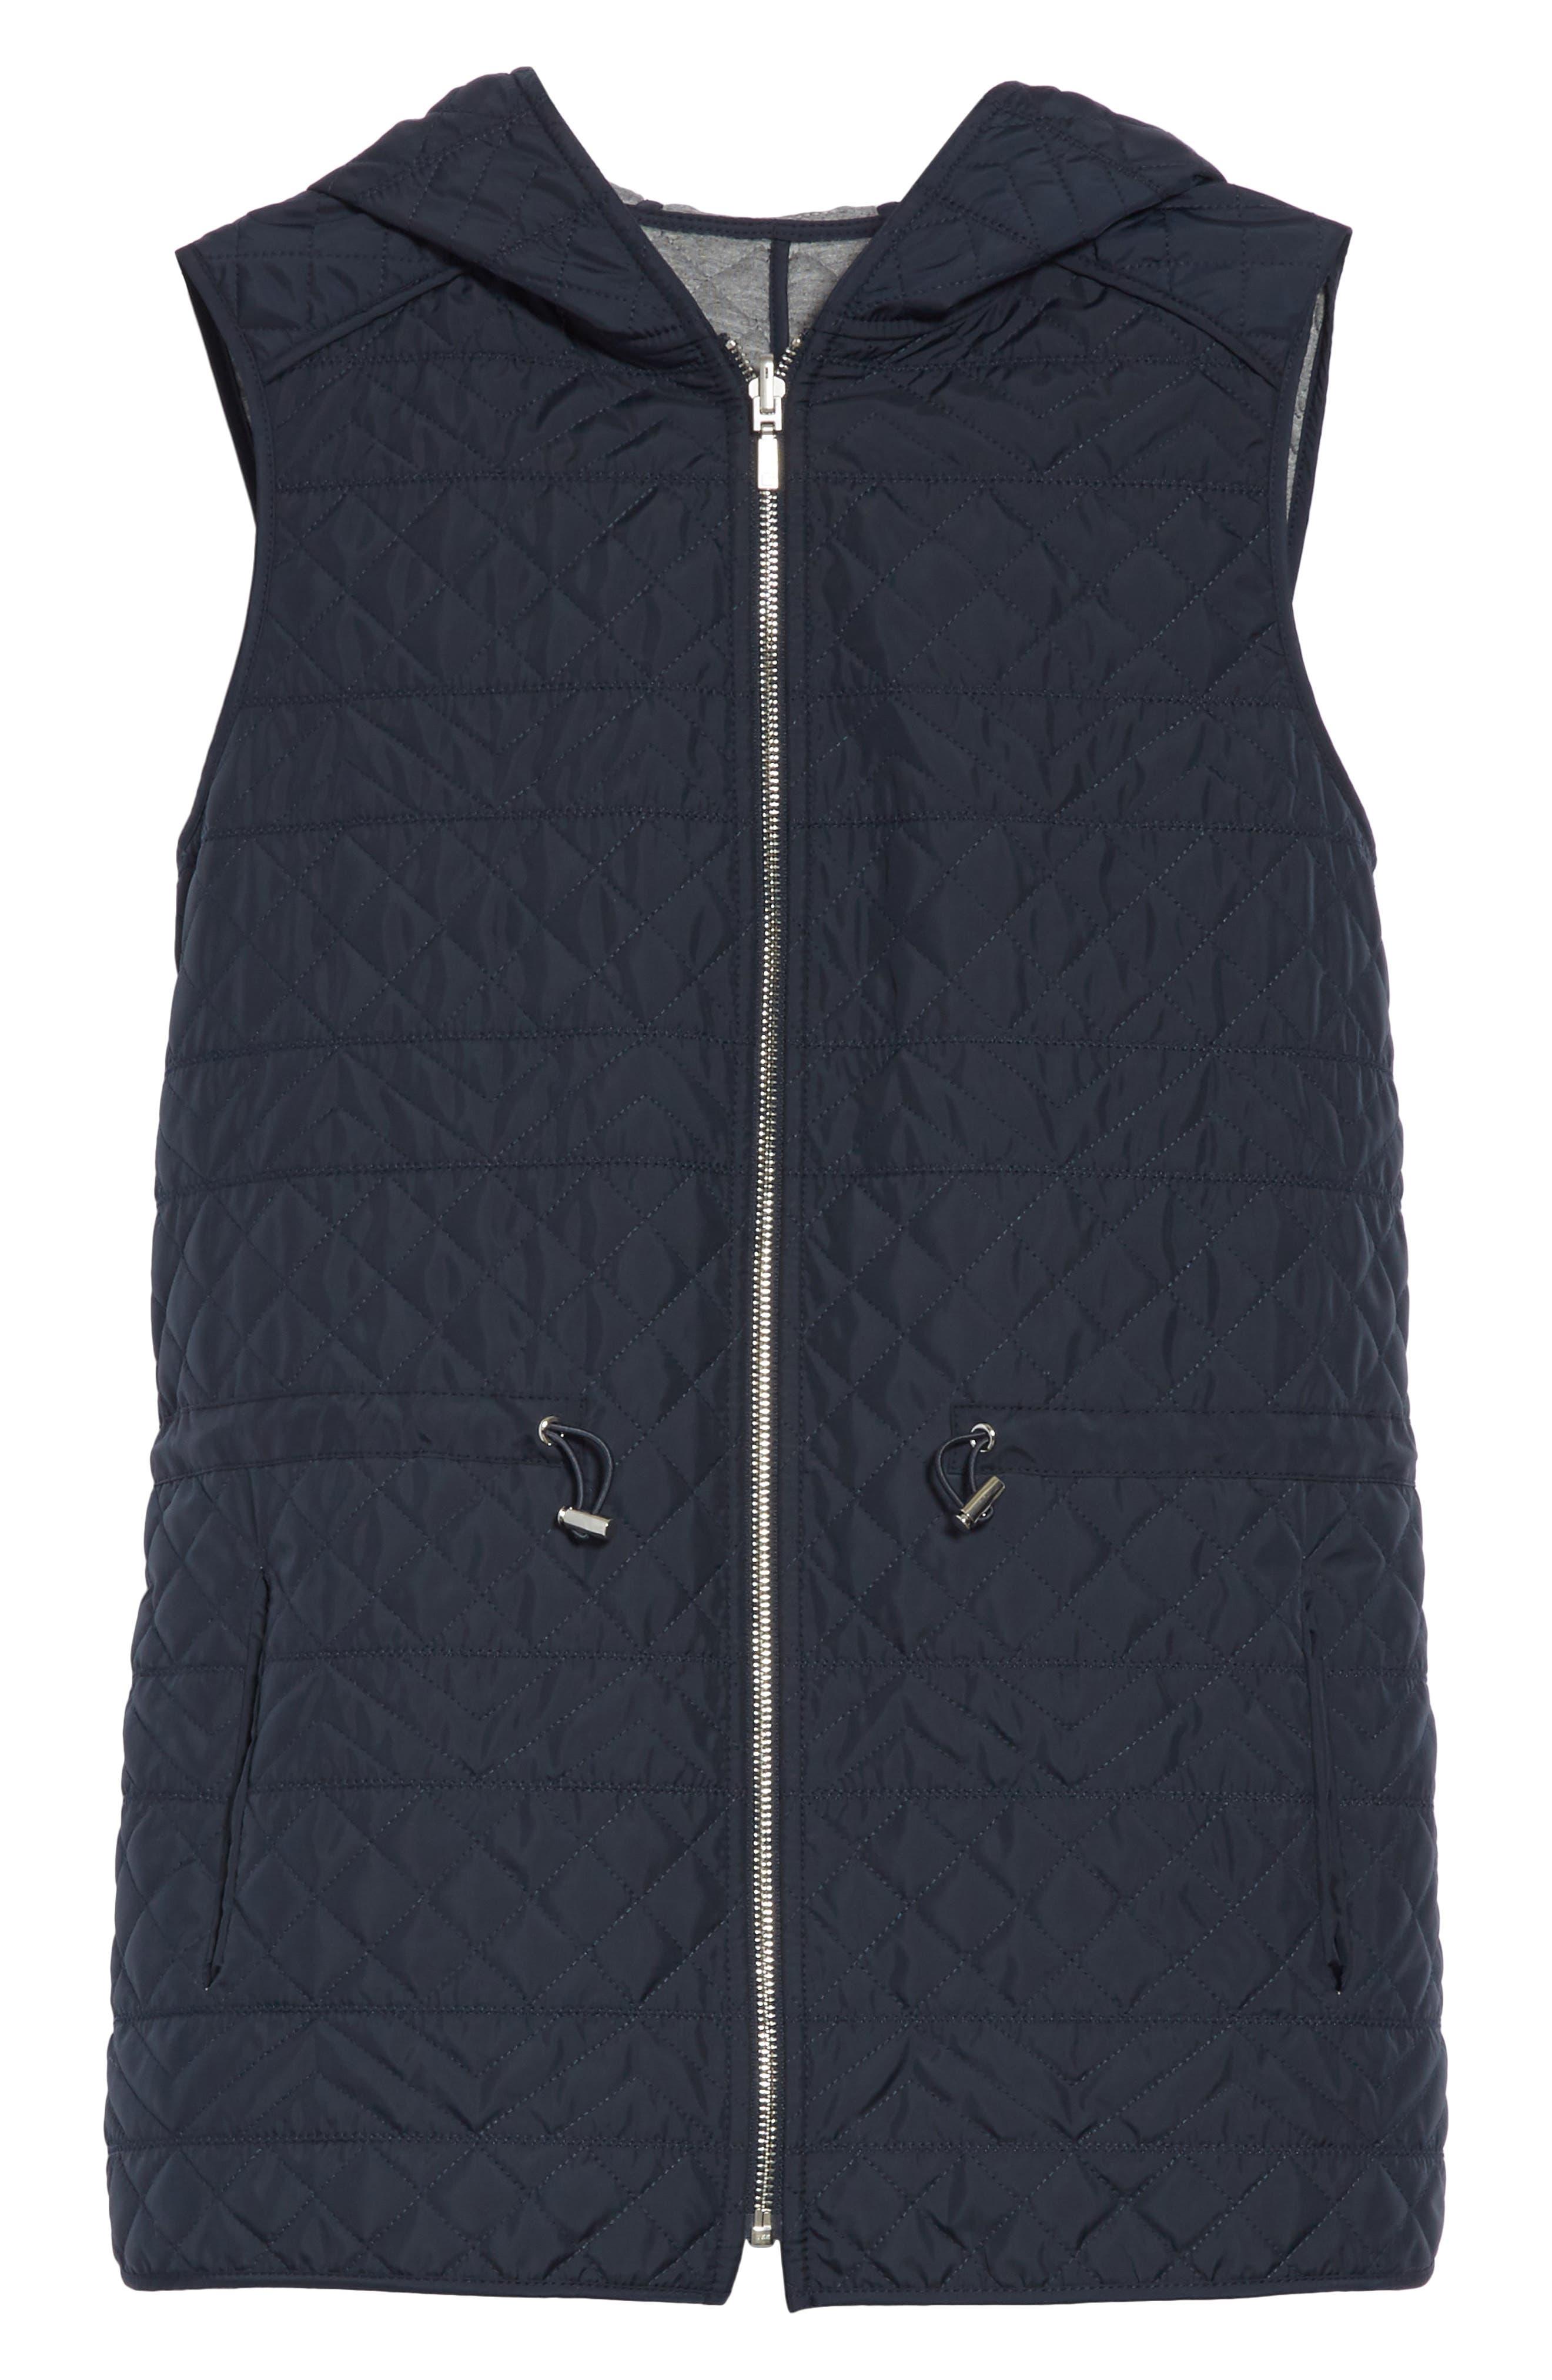 Ginny Reversible Hooded Vest,                             Alternate thumbnail 8, color,                             Ink/ Nickel Melange